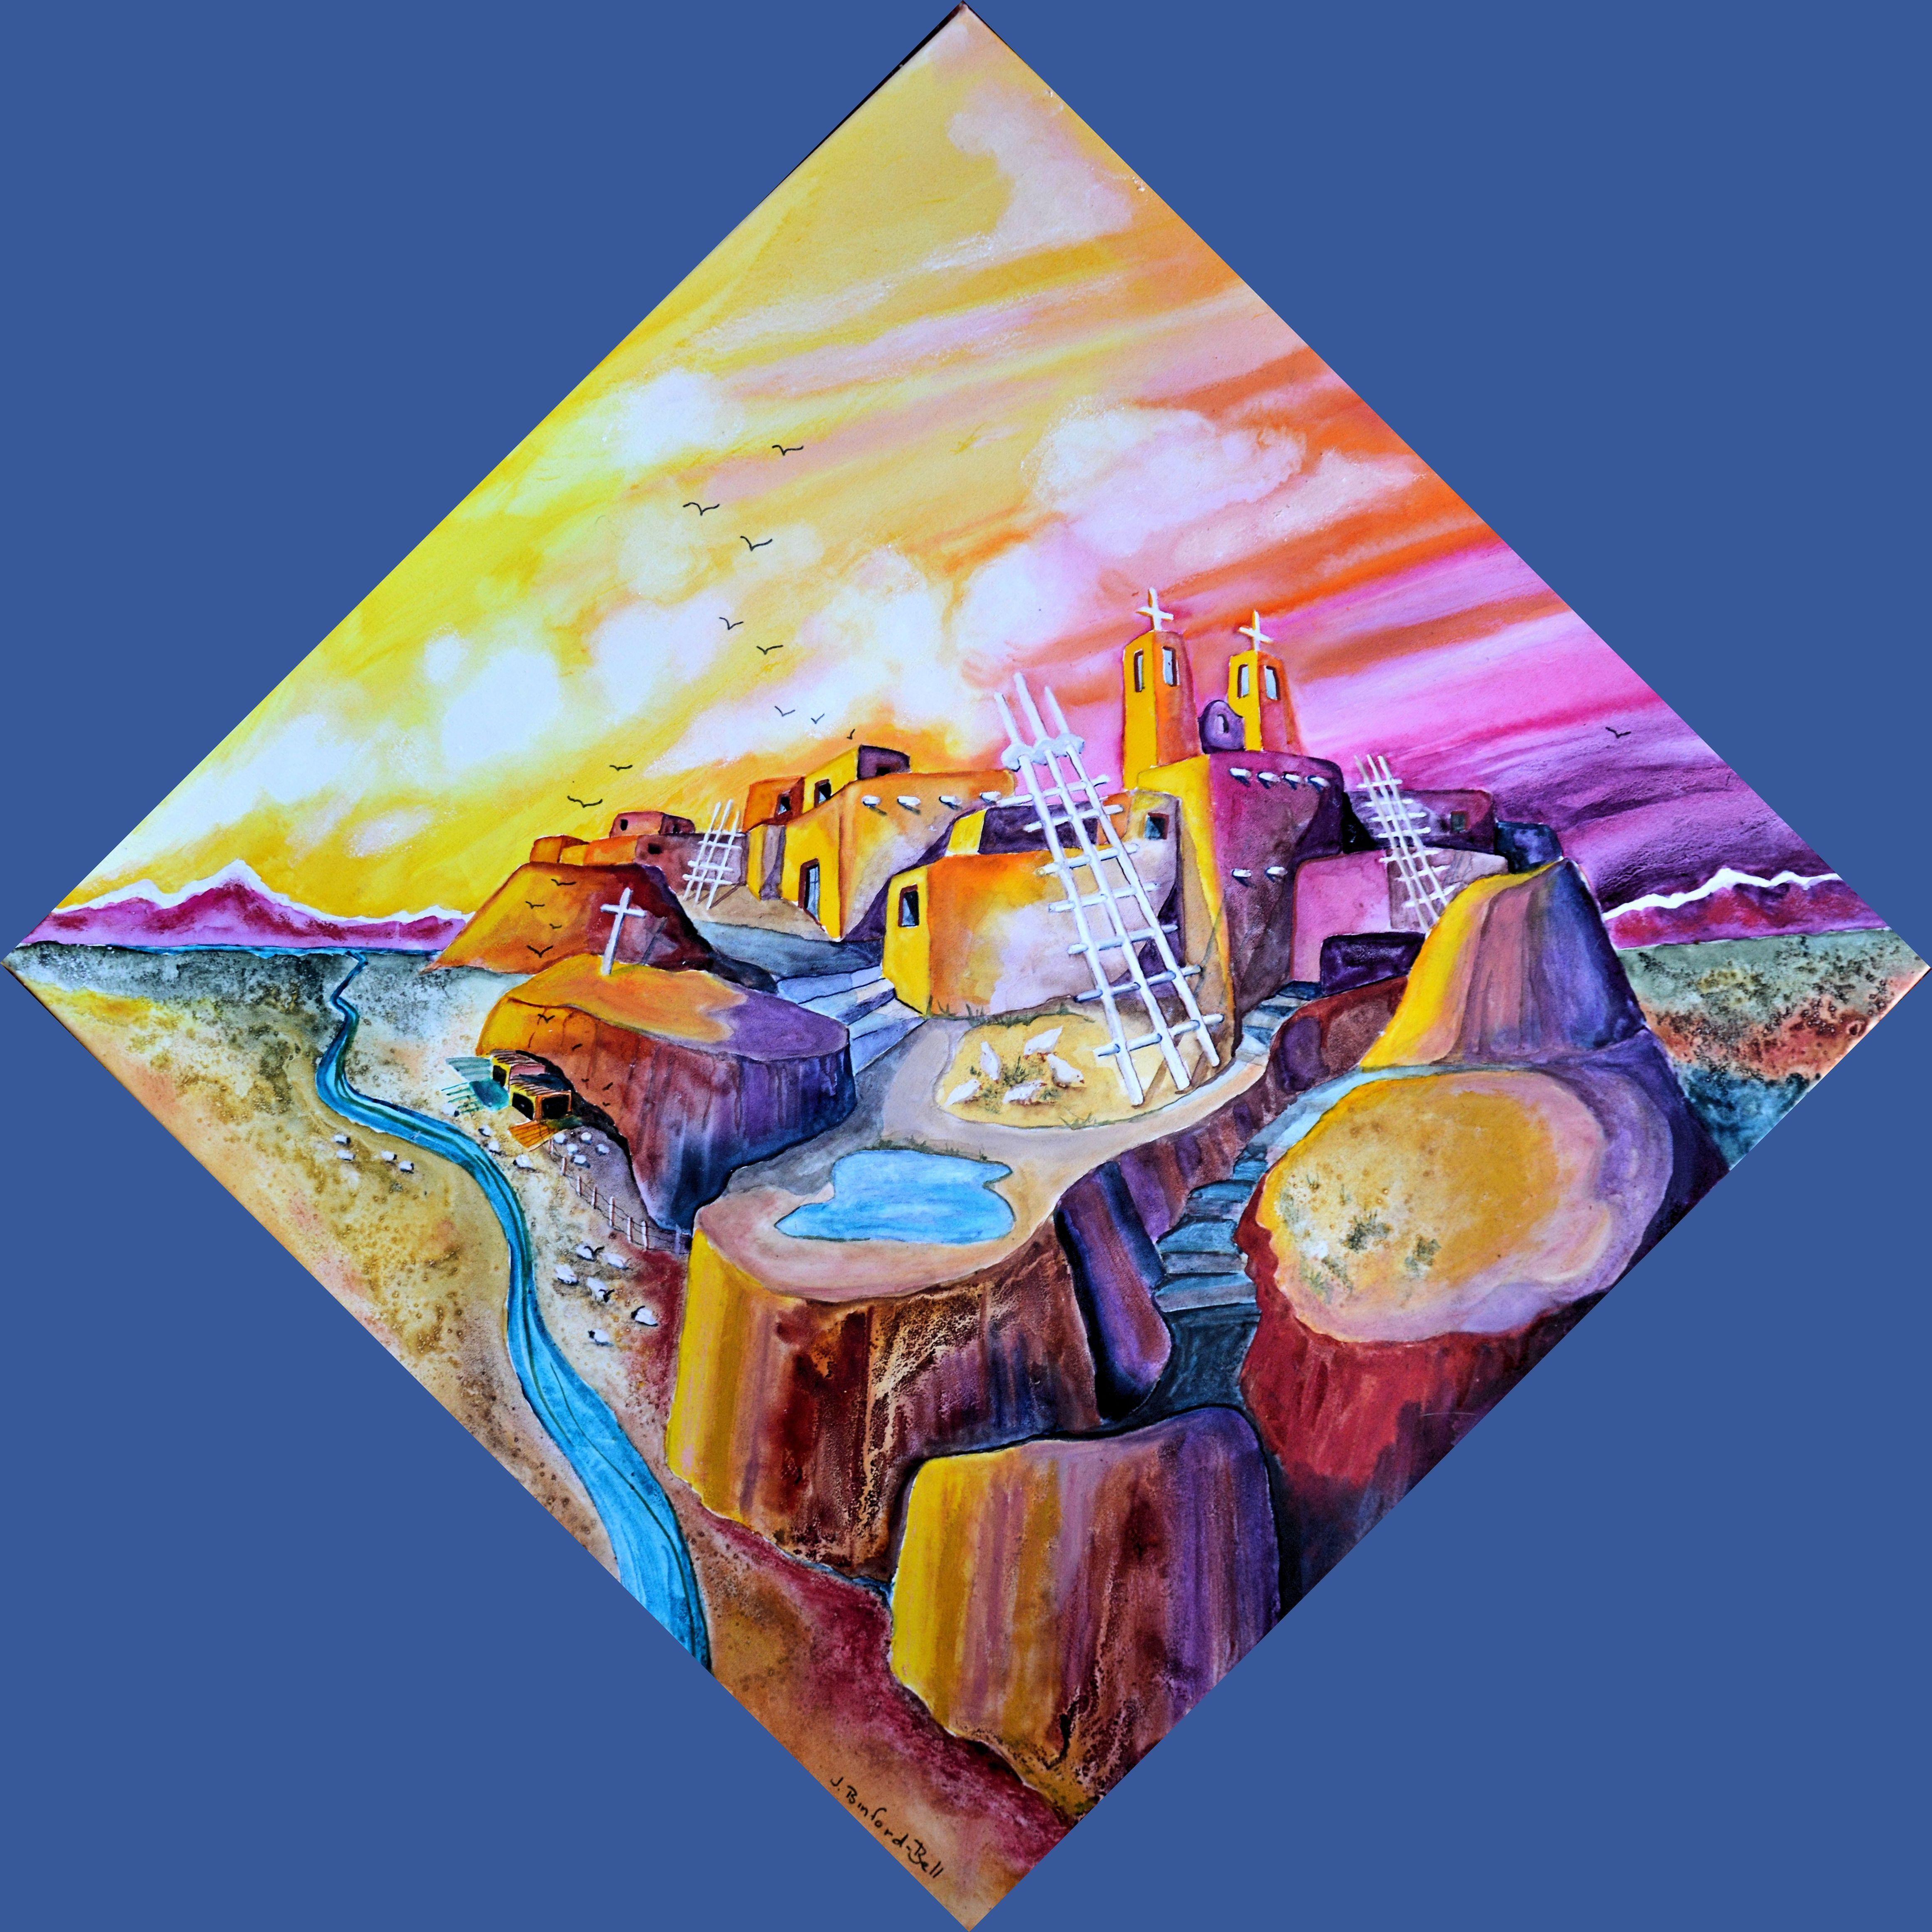 High Pueblo Dawn 28 x 28 Mixed media on Canvas $1775